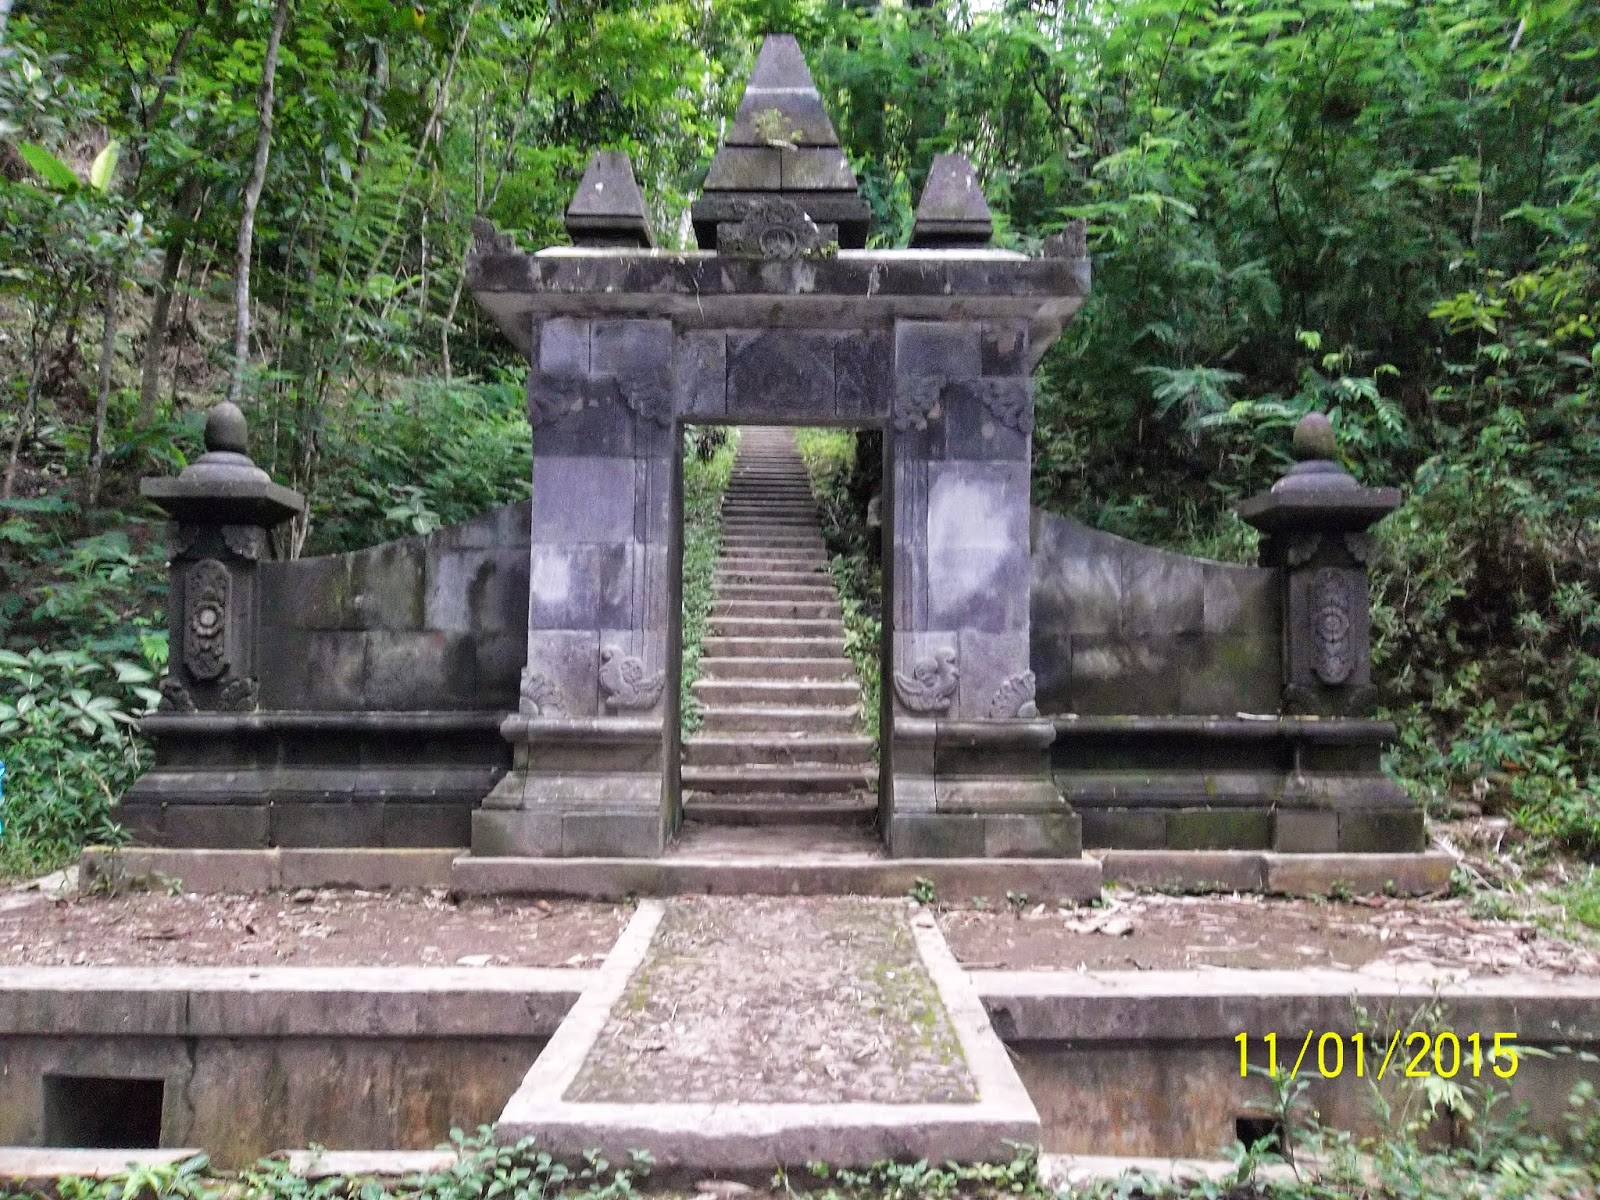 Blusukan Situs Candi Selogriyo Lukisan Alam Selogrio Kab Magelang